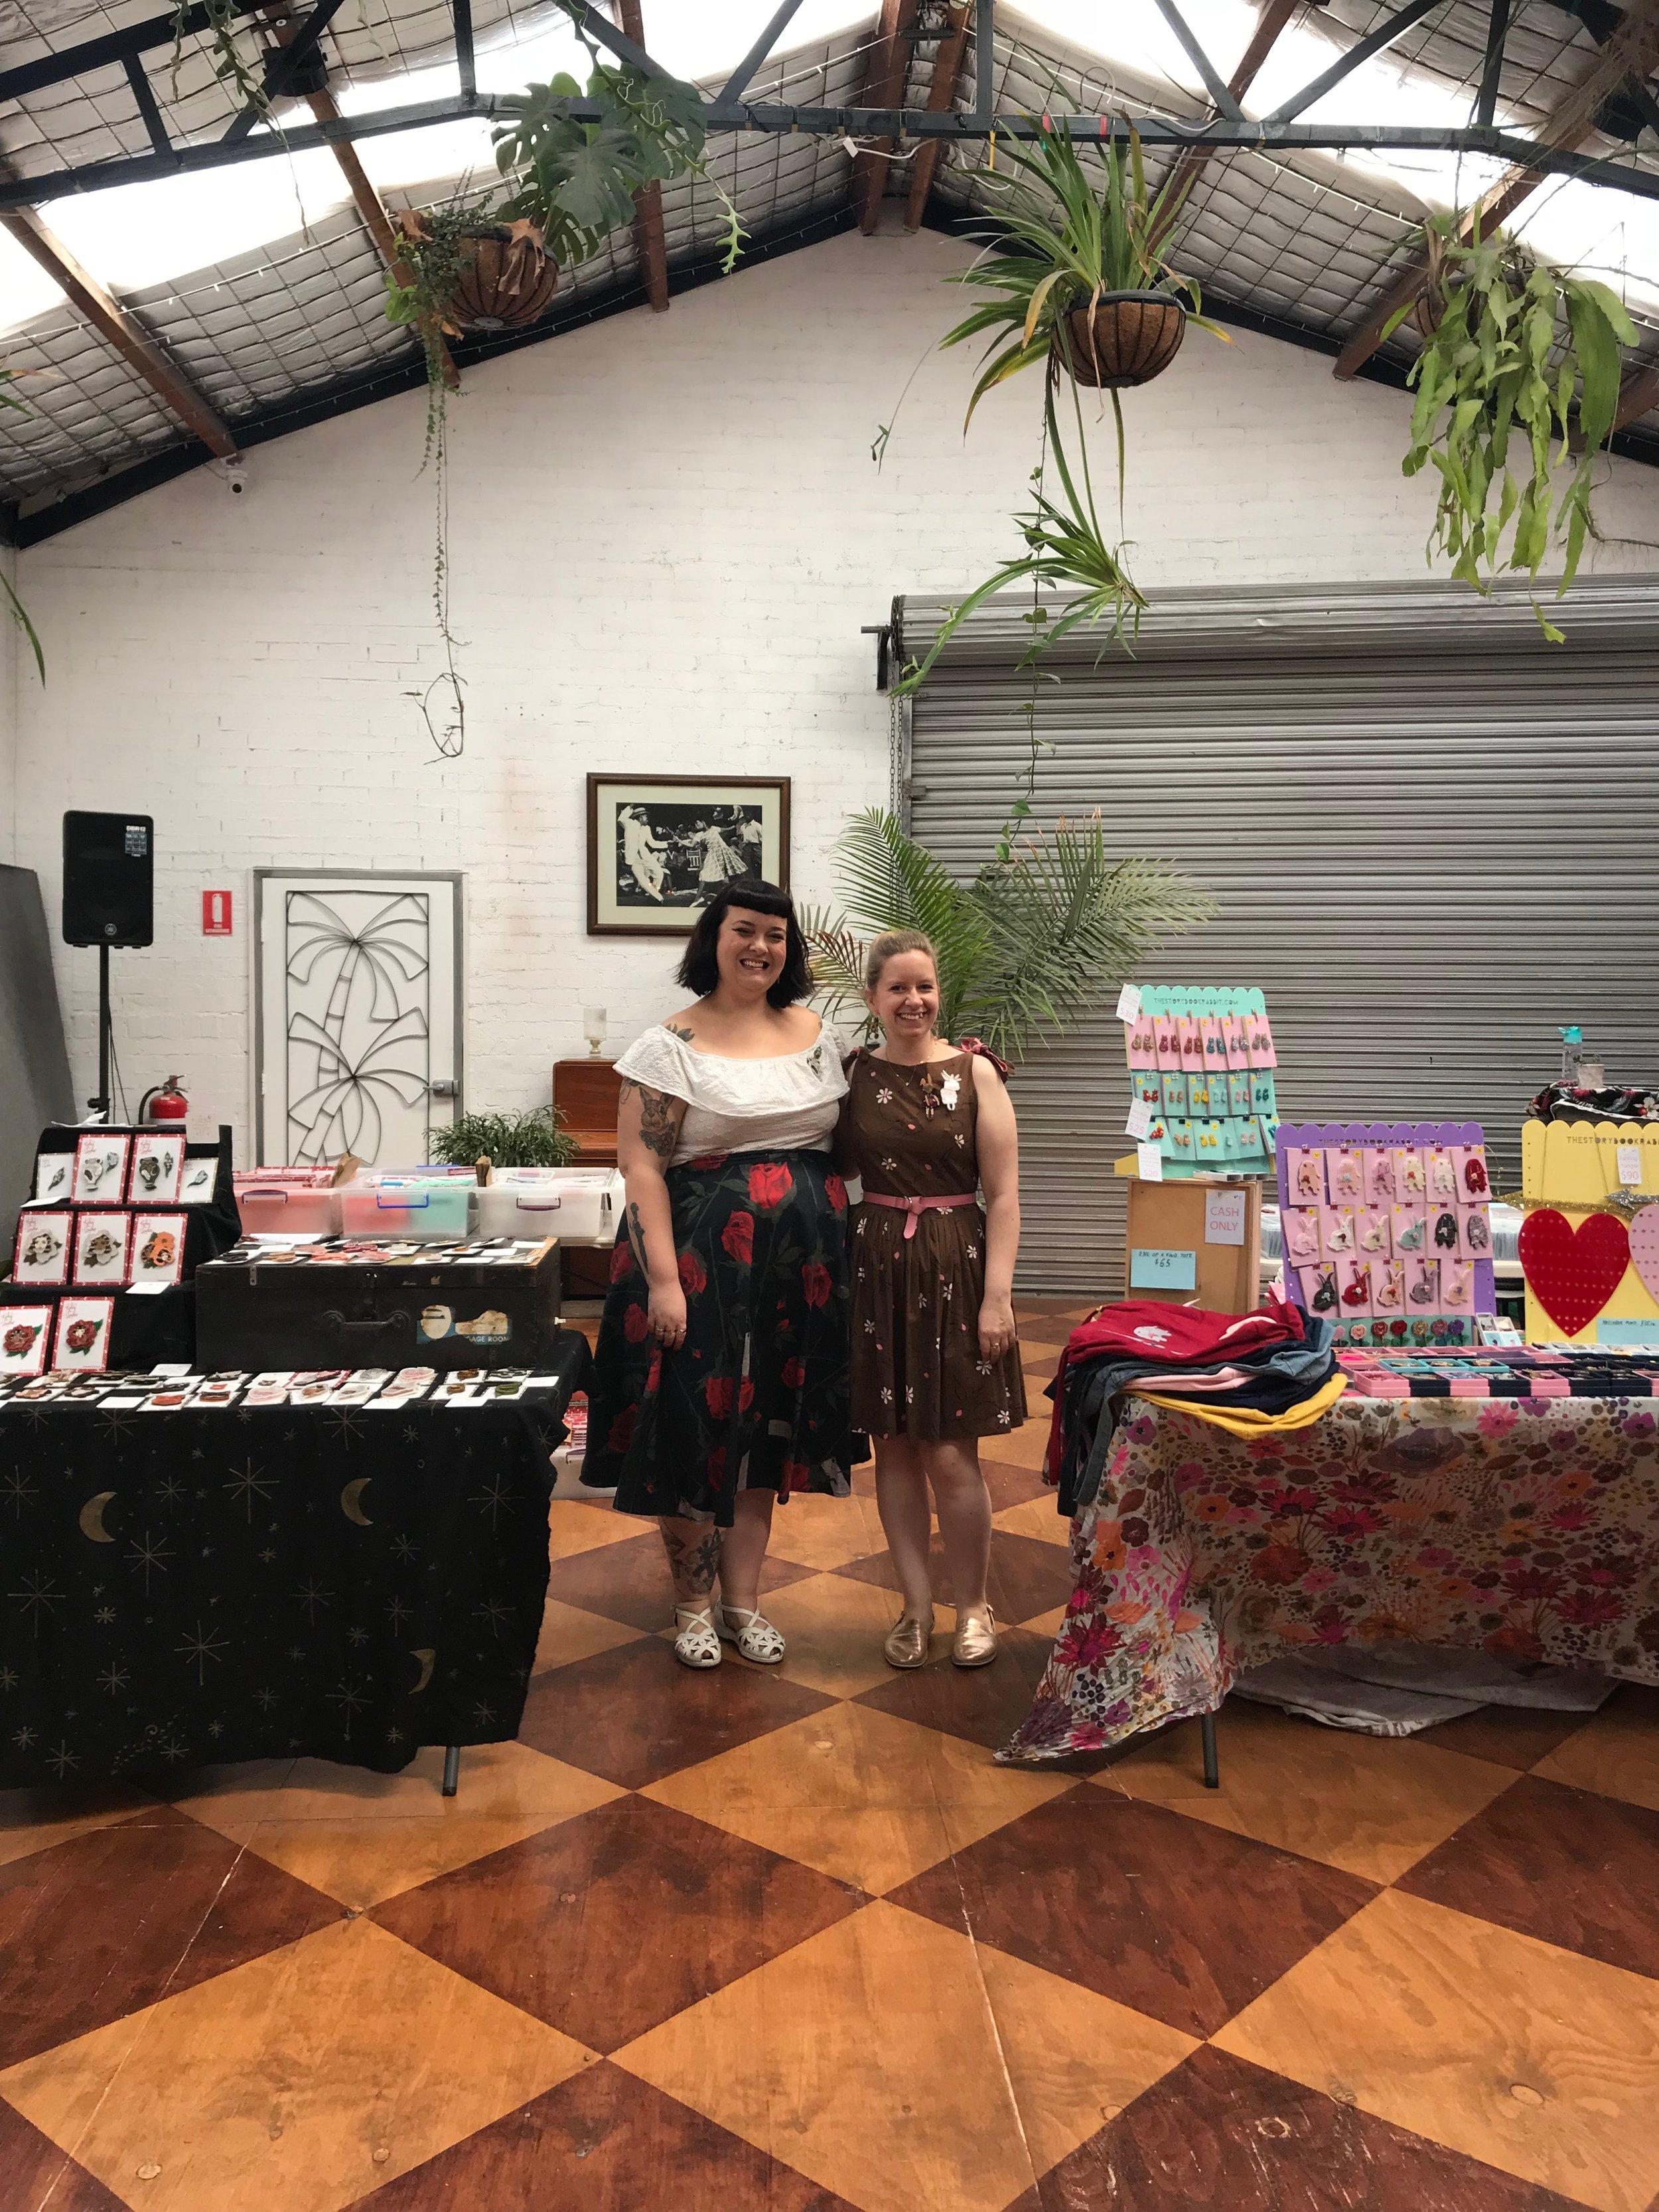 2018 Besties Brooch market, Kirbee Lawler and Kelly White AKA The Storybook Rabbit